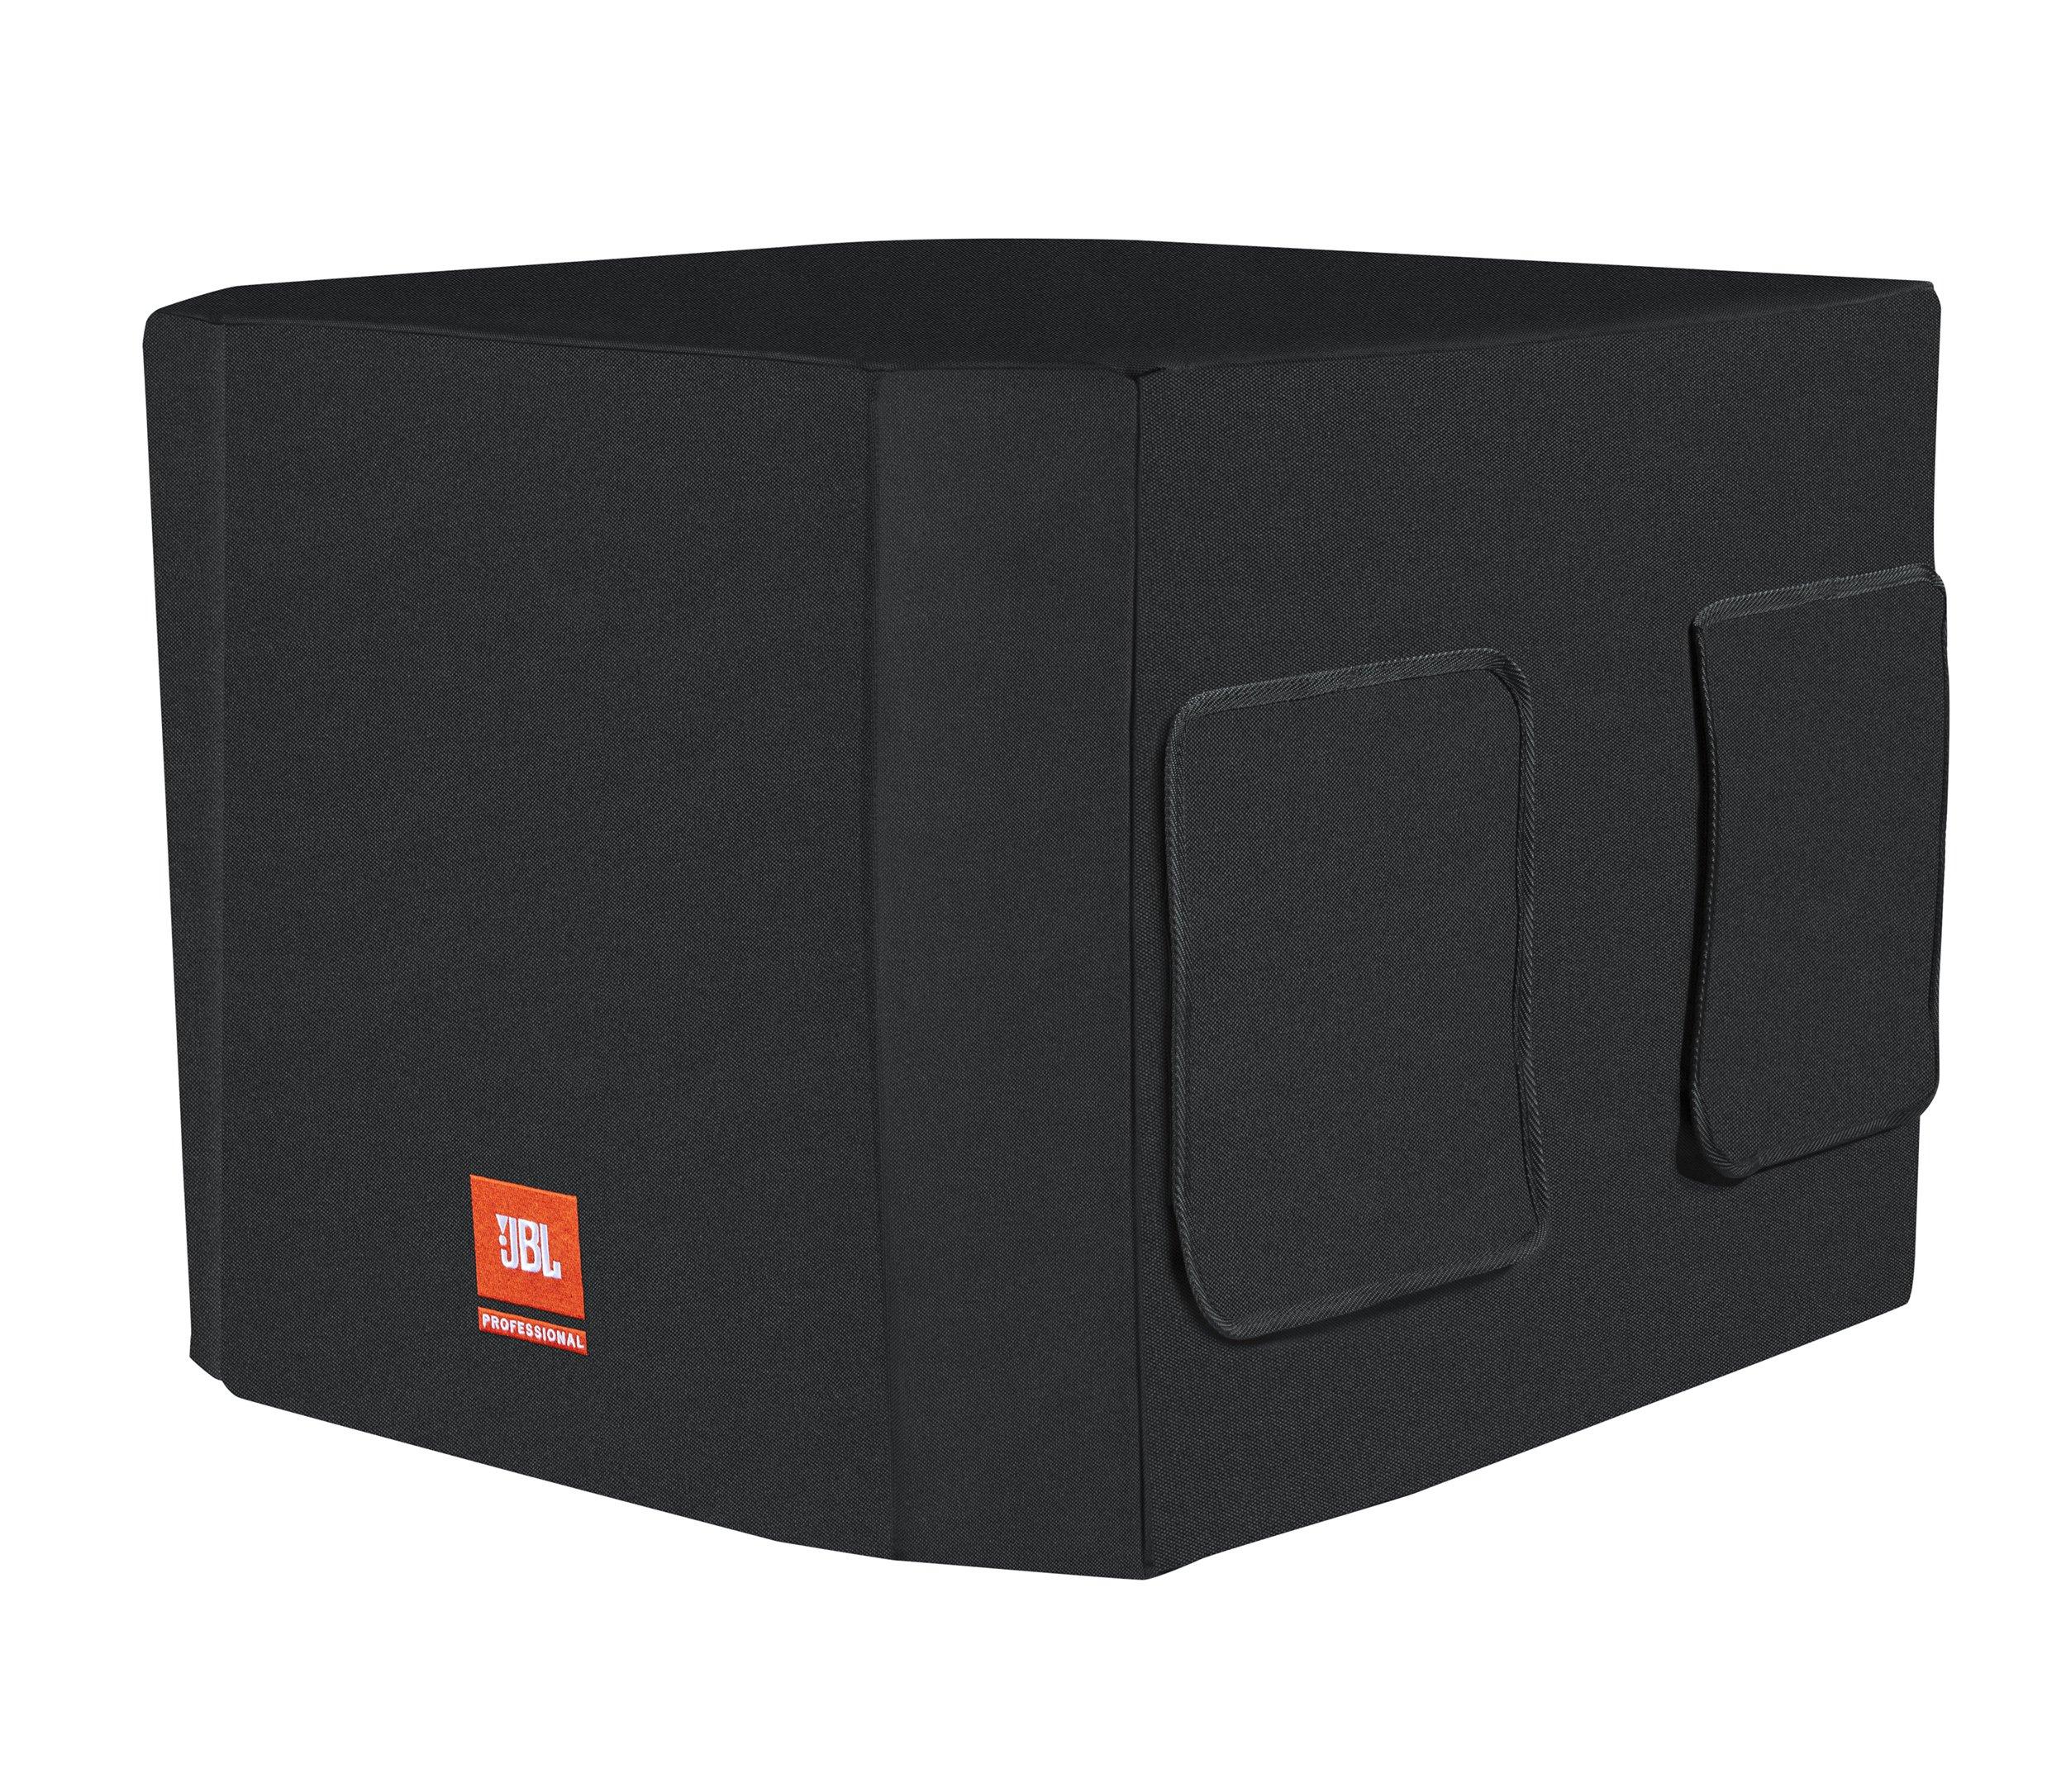 JBL Bags SRX818SP-CVR-DLX Deluxe Padded Protective Cover for SRX818SP-CVR